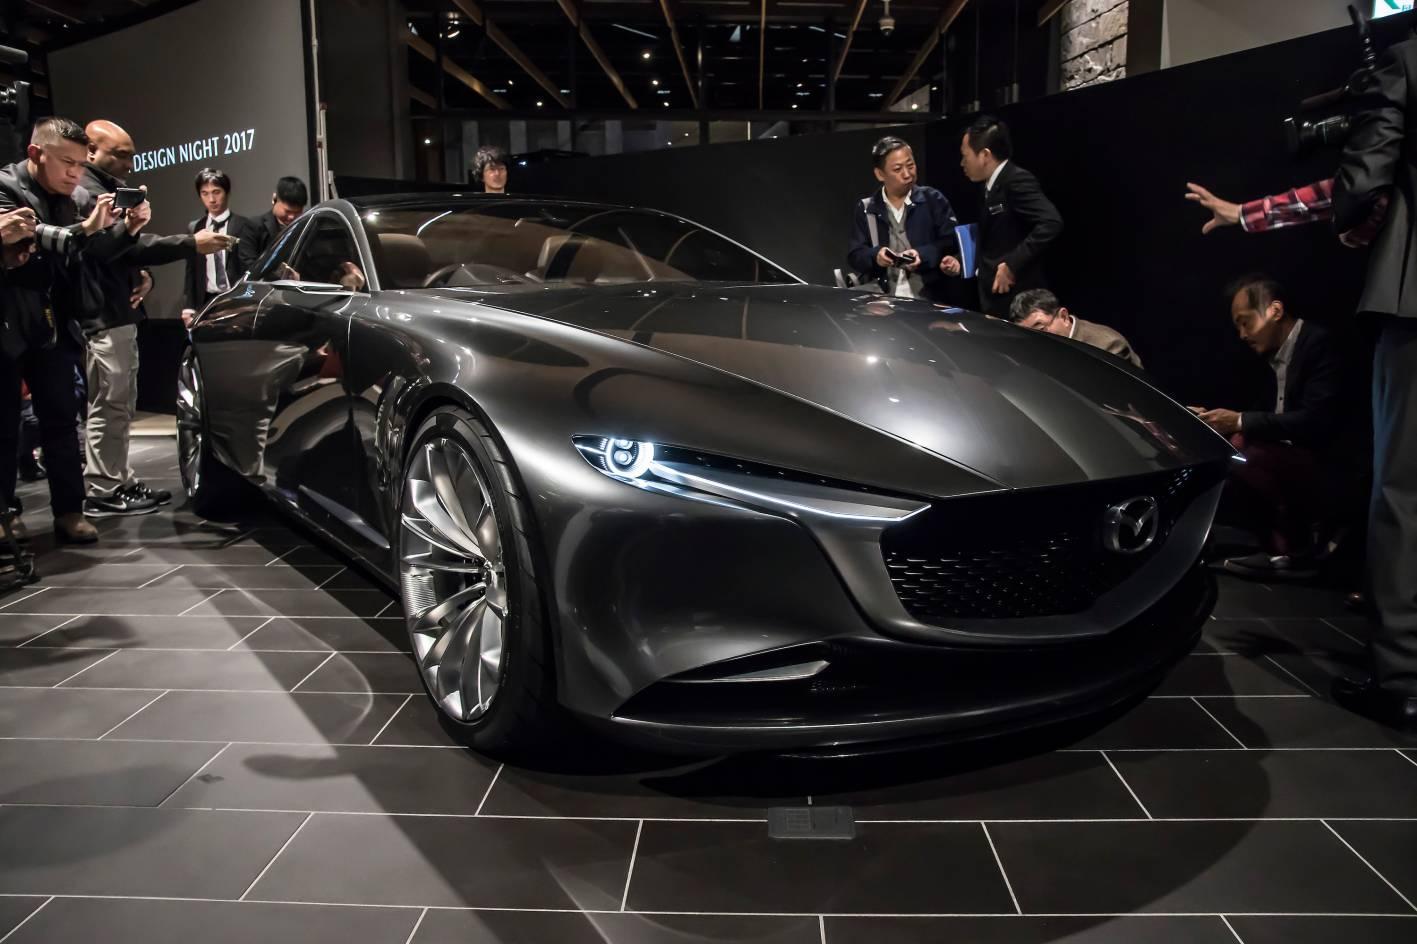 Mazda 3 Kai >> 2017 Mazda Kai & Vision Coupe concepts unveiled at Tokyo Motor Show | Top10Cars